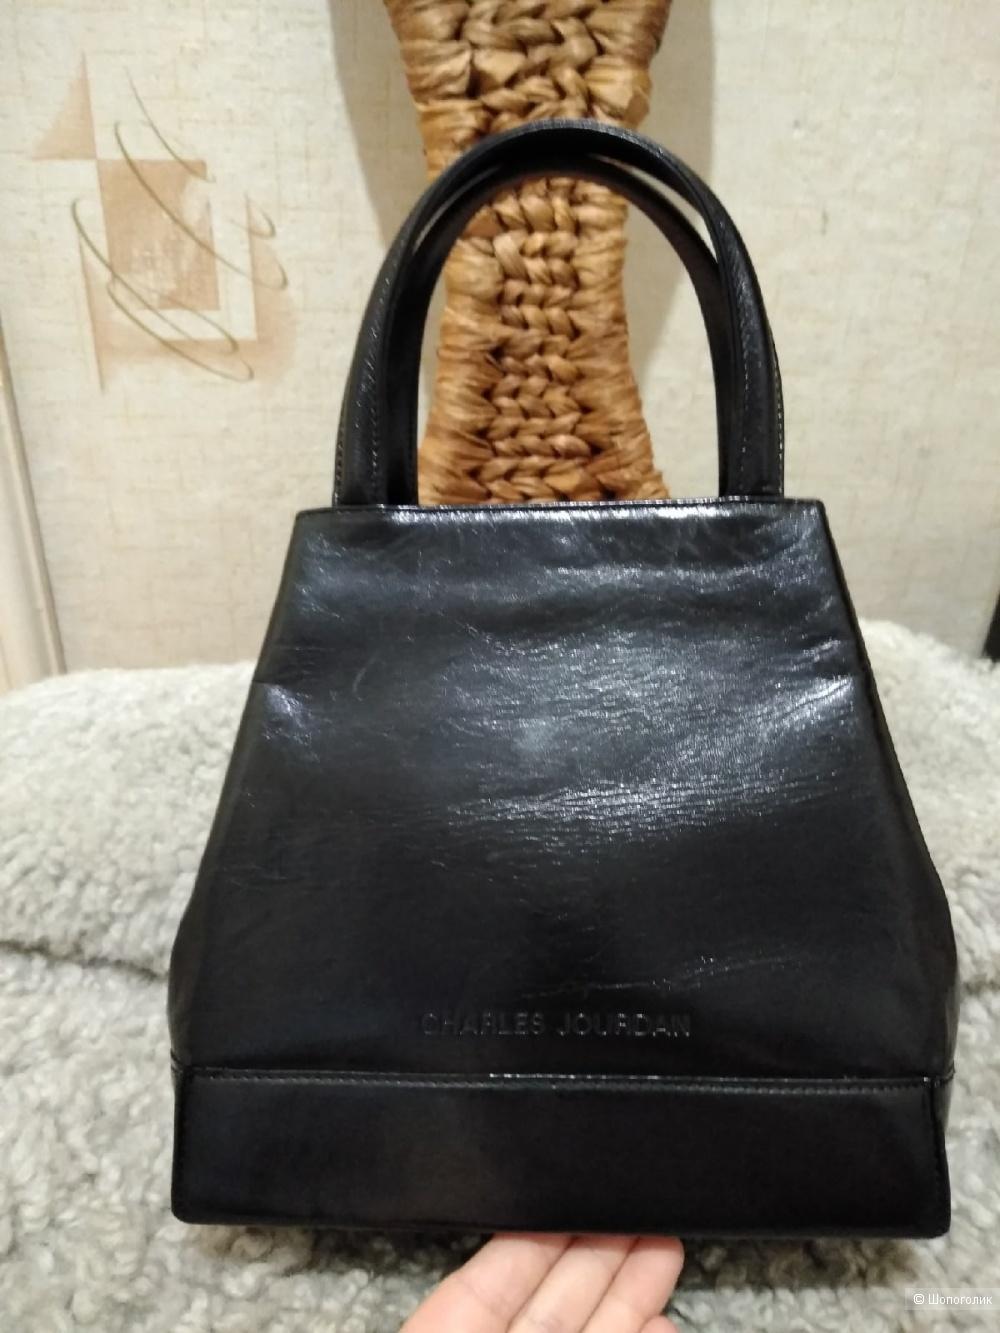 Сумка из натуральной кожи Charles Jourdan Handbags.